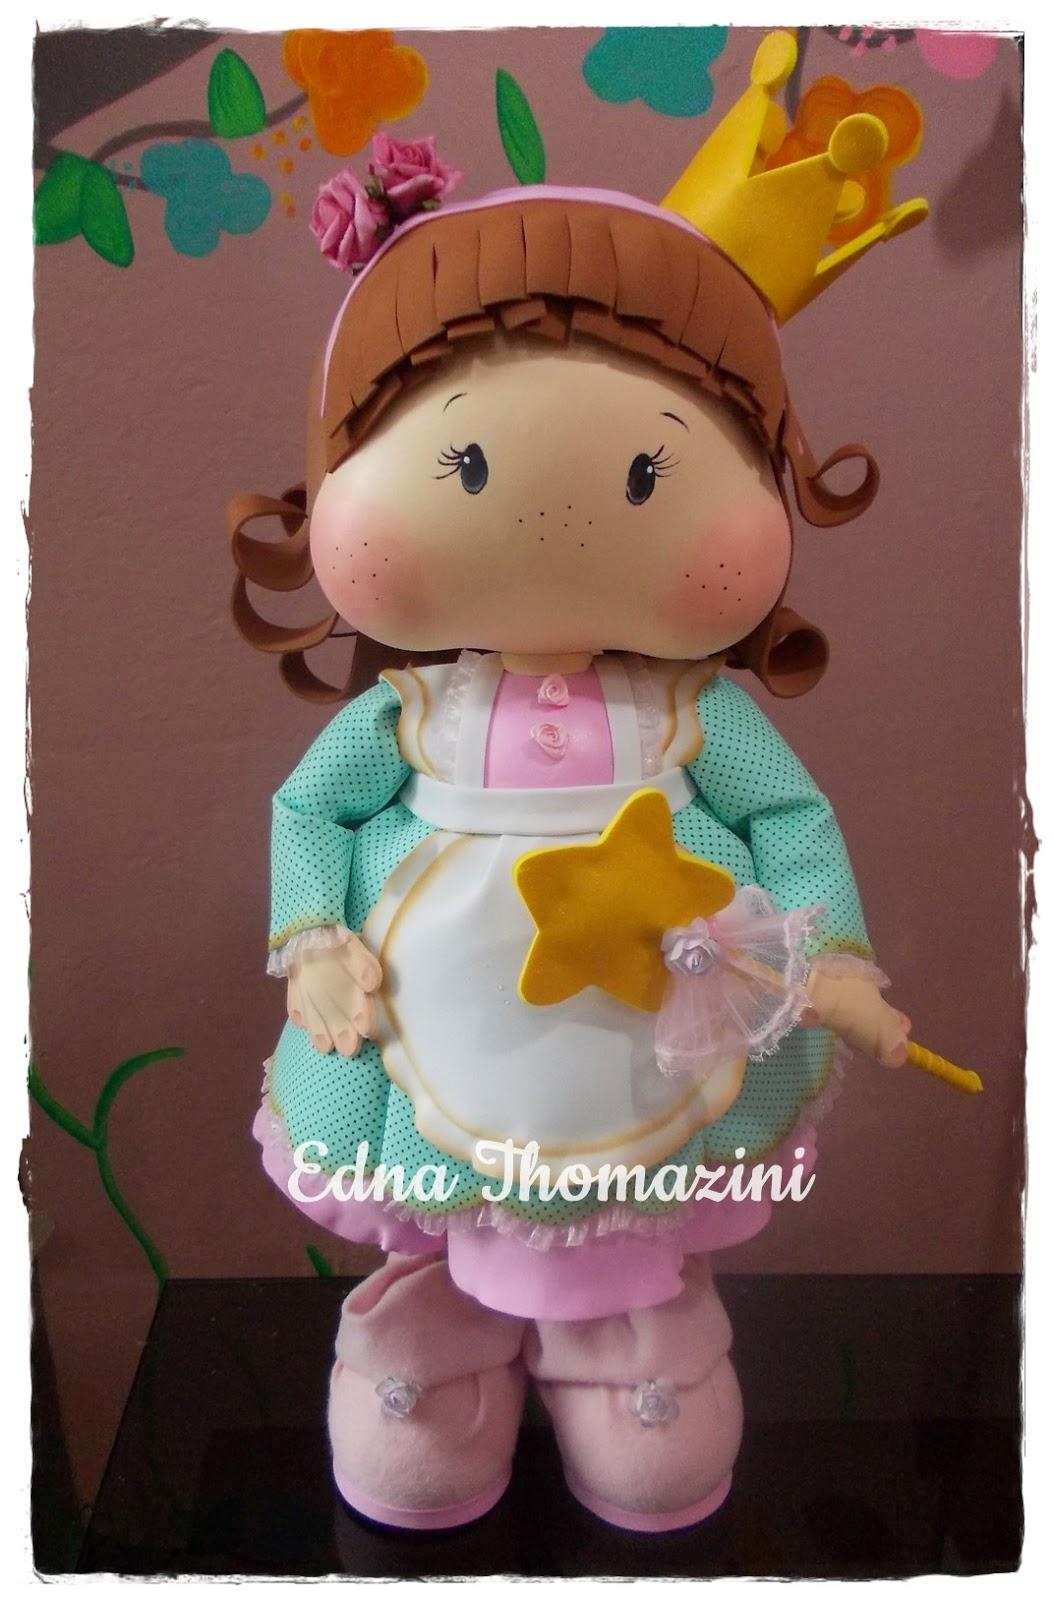 Edna Thomazini ~ Boneca Magnólia Gigante Edna Thomazini Ateli u00ea Criativo